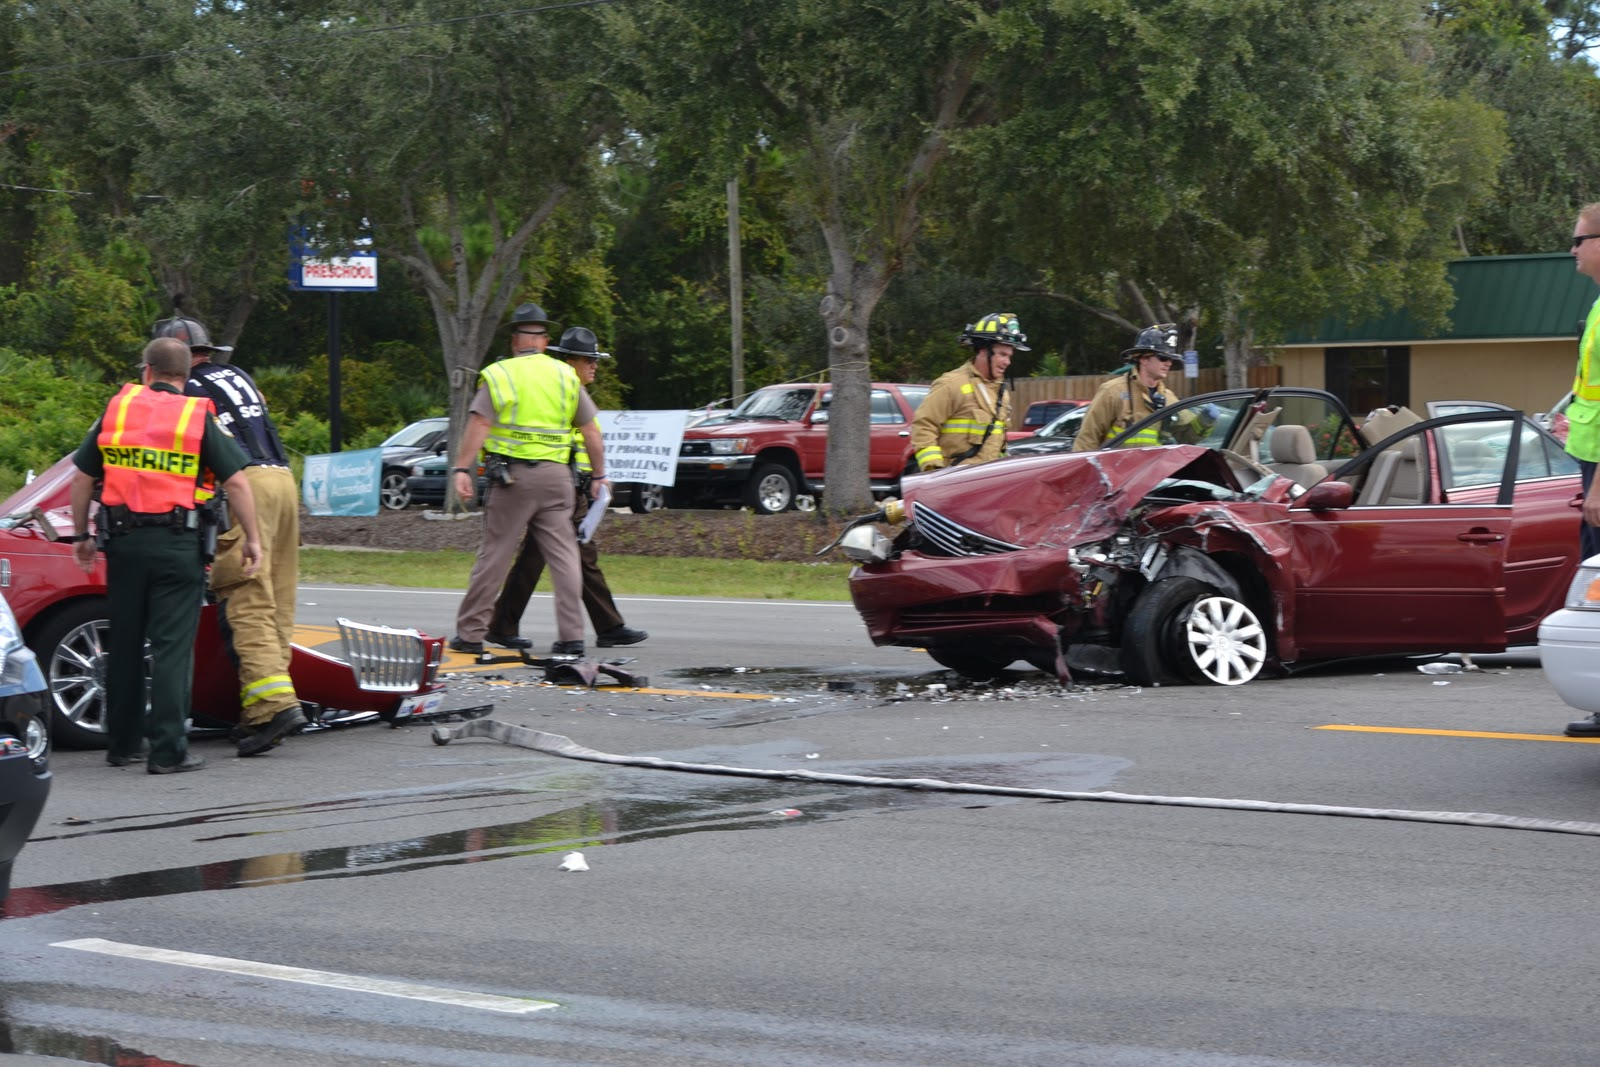 Head On Crash Closes Courtney Parkway In Merritt Island: VIDEO